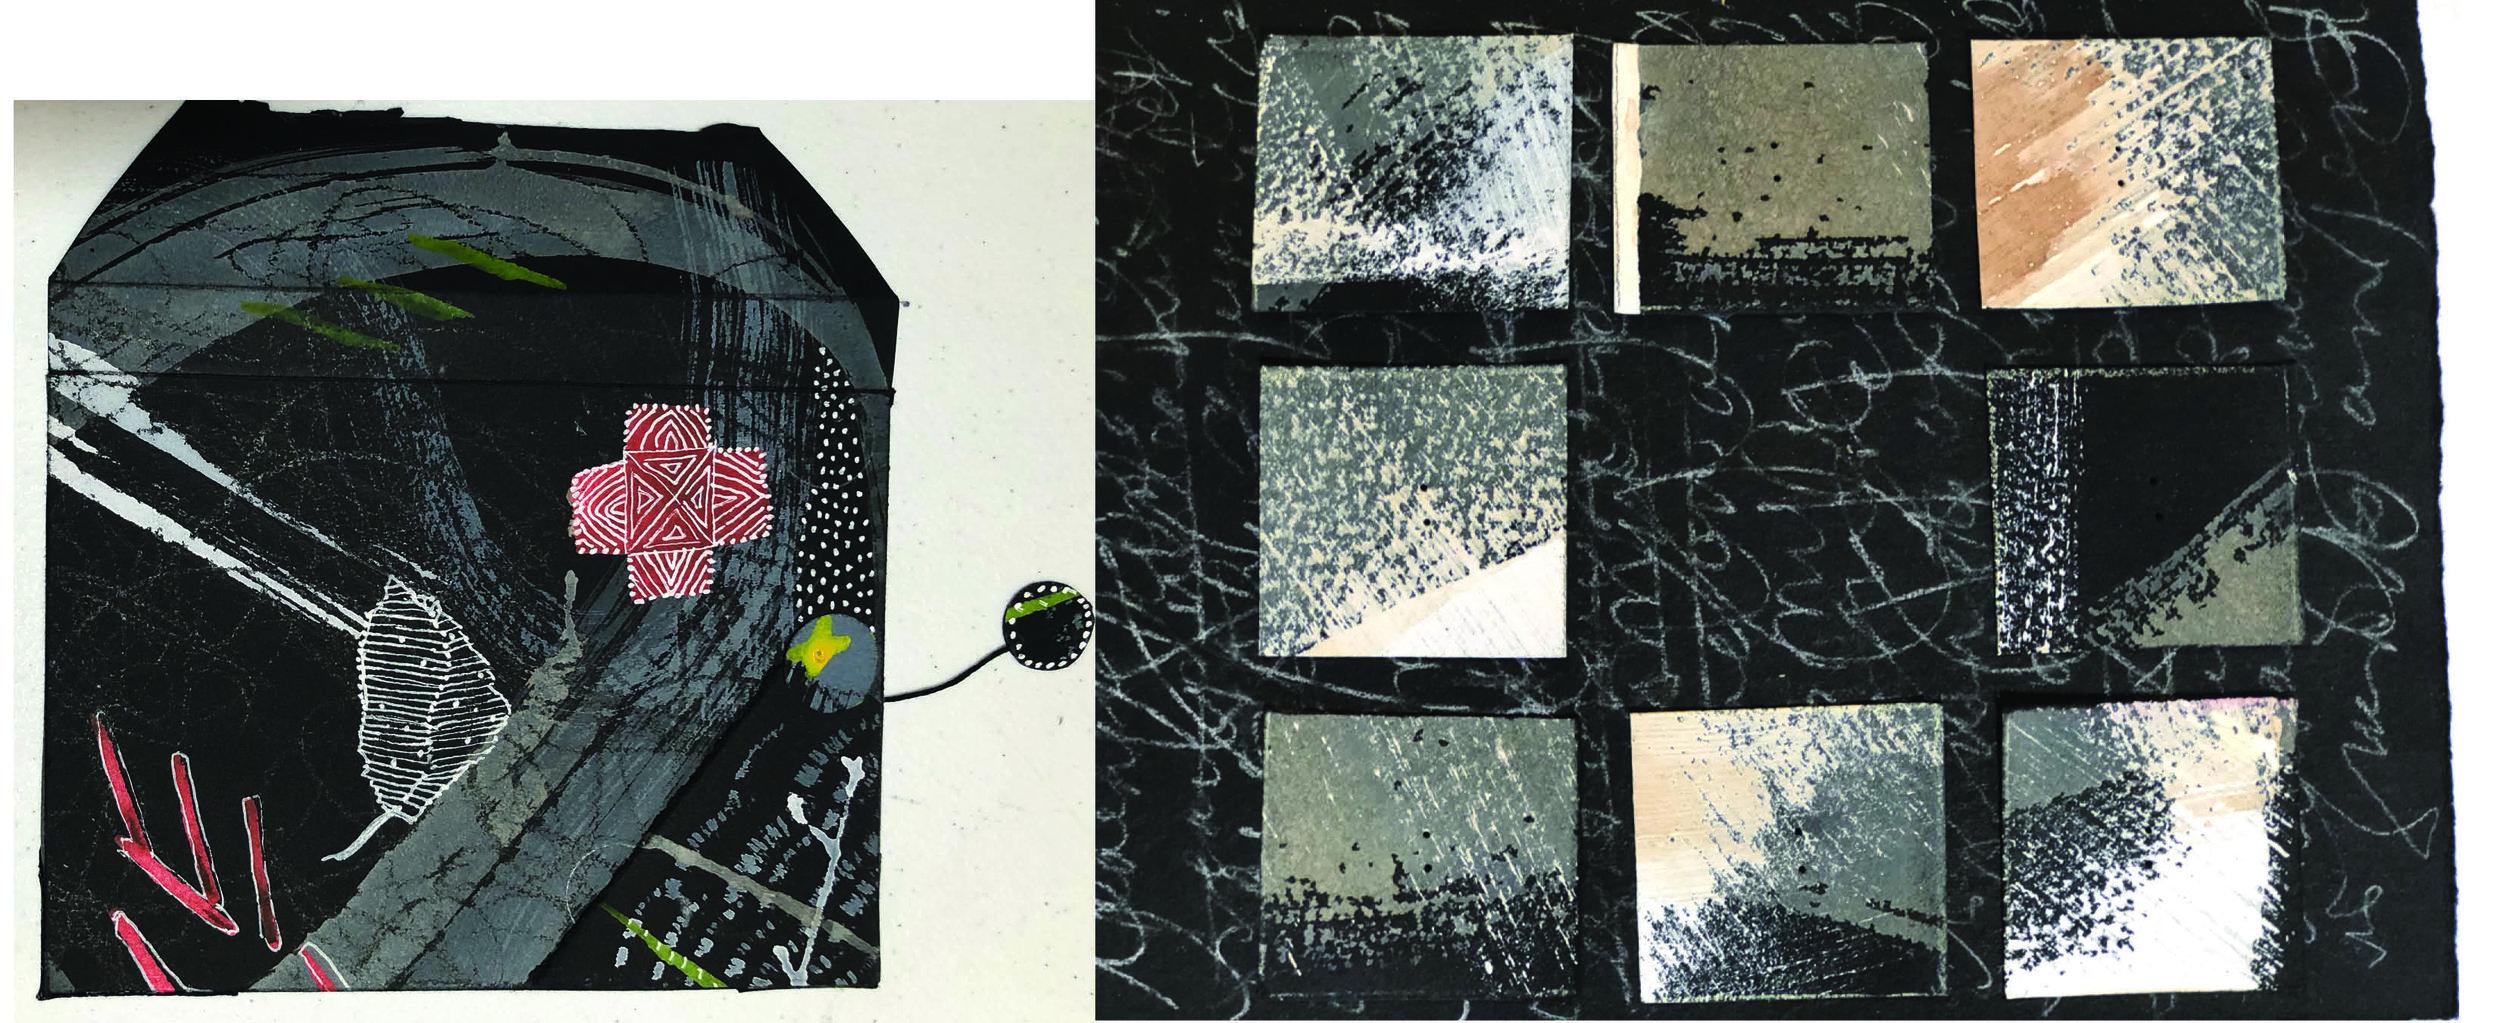 Book case by Happy Price (left)                  Work in progress by Deb Jones (right)